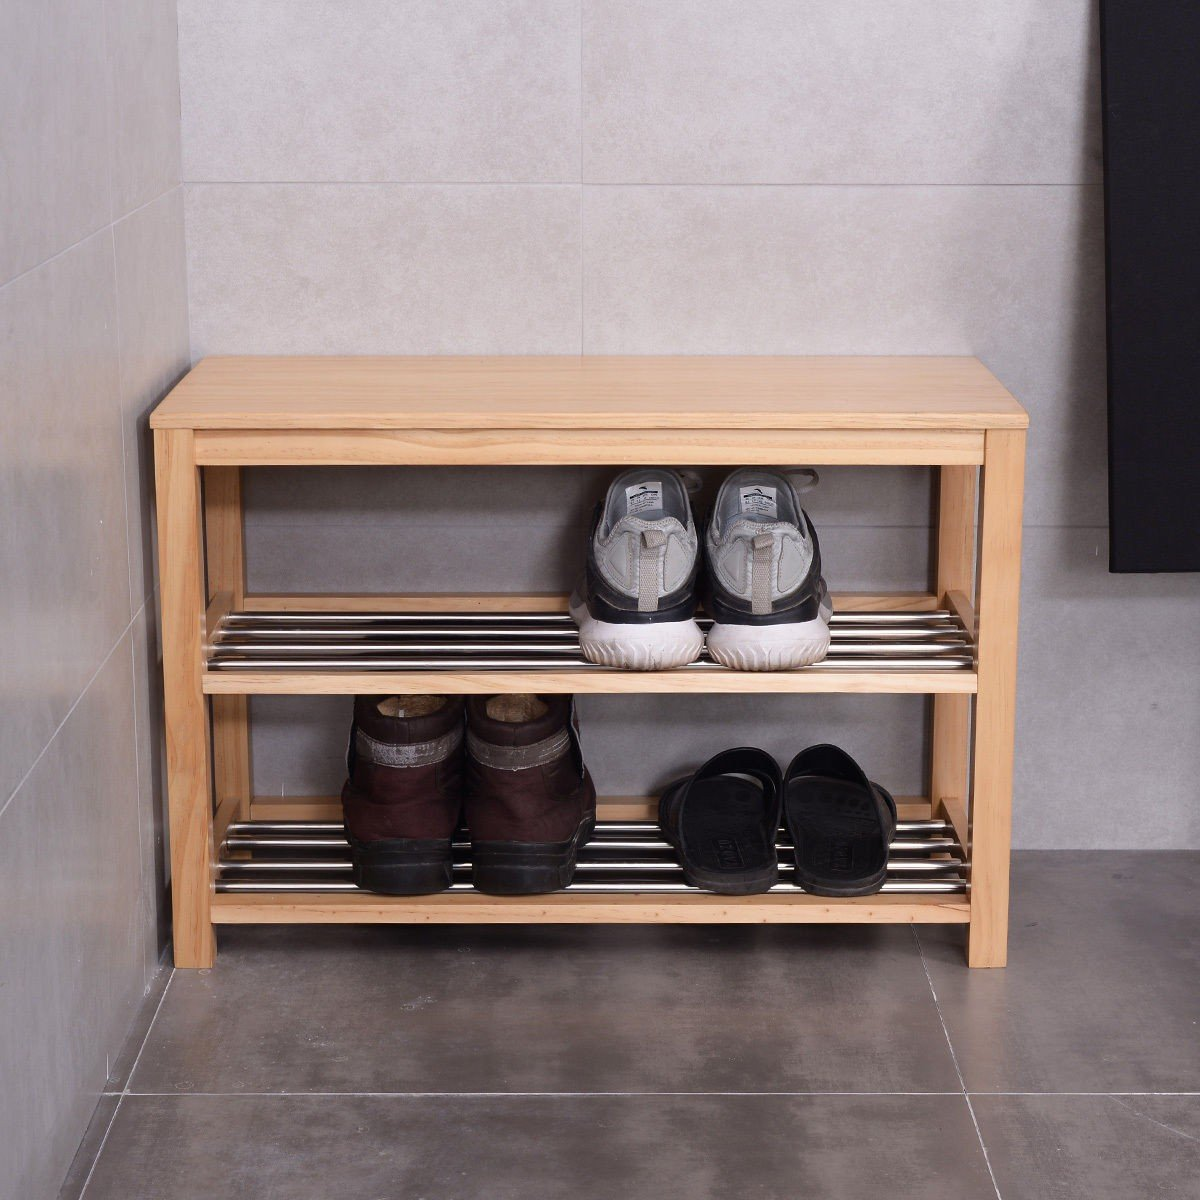 MyEasyShopping 3-Tier Wooden Shoe Rack Storage Bench, Wood Wooden Closet Entry Bathroom Kitchen Shoes Shelf Natural Color, Shoe Wood Rack Storage Bench Closet Bathroom Kitchen Entry by MyEasyShopping (Image #5)